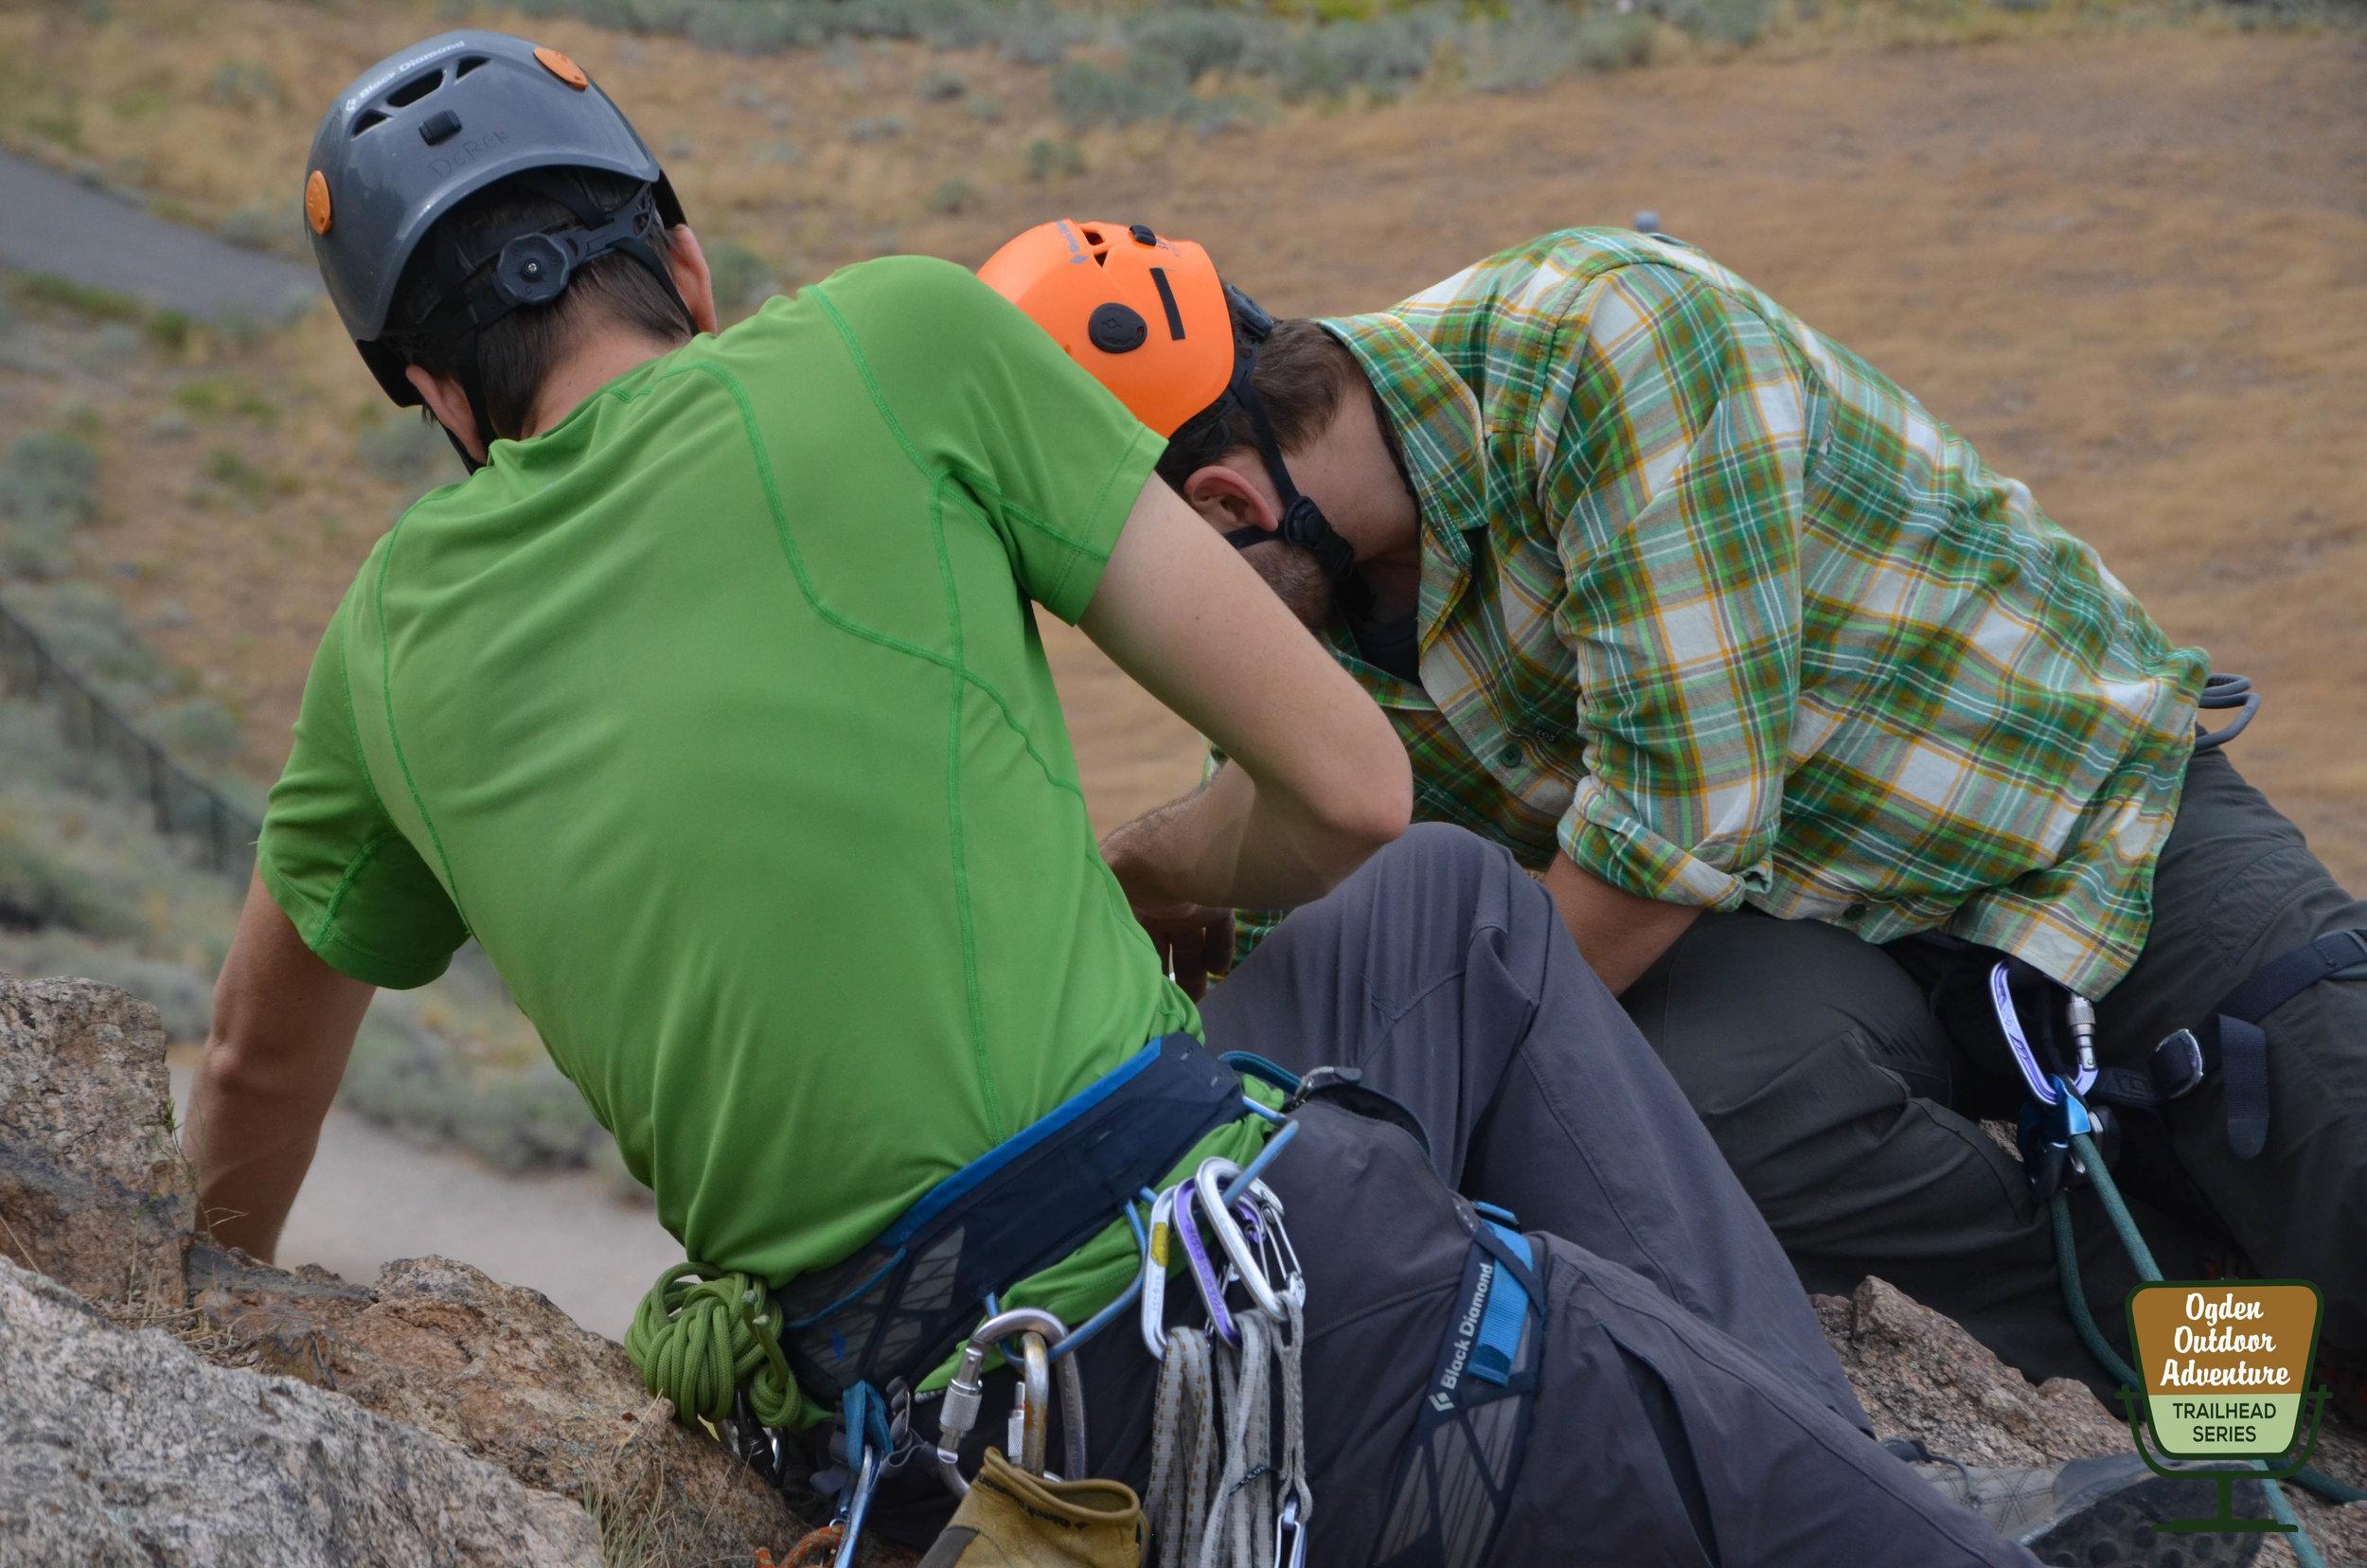 Ogden Outdoor Adventure Show 248 - Bear House Mountaineering-8.jpg